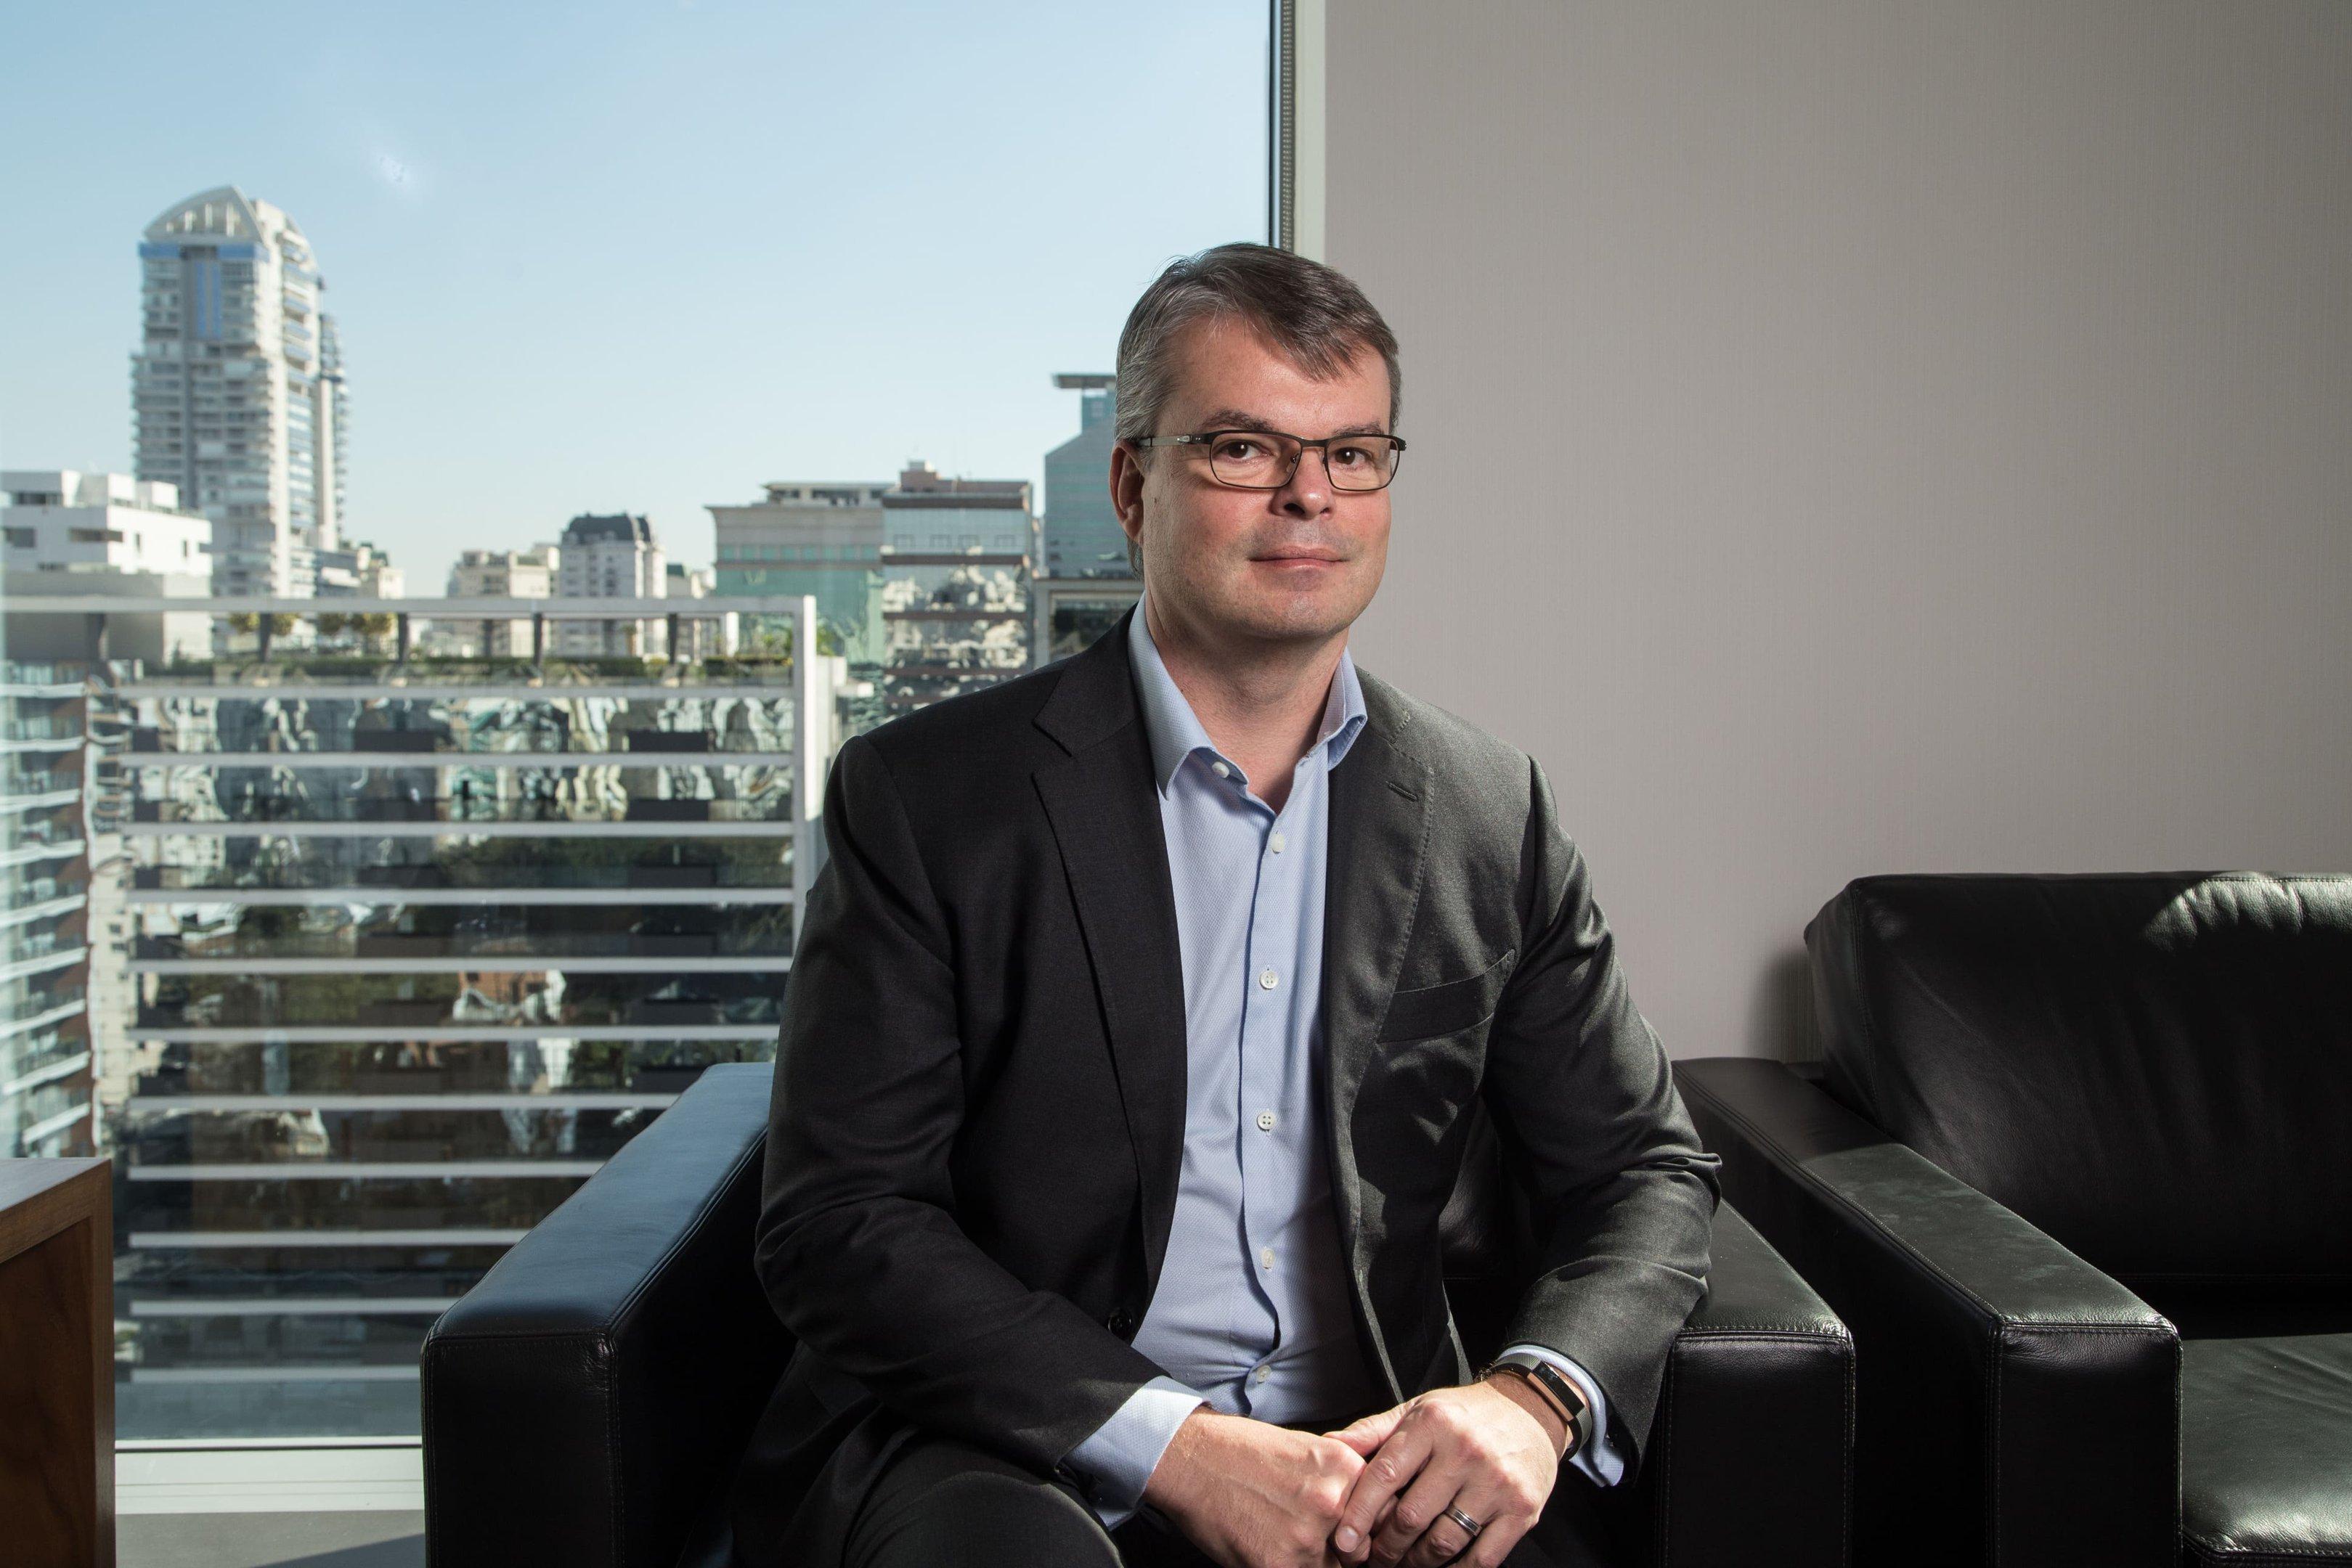 tony-volpon-economista-whg-ex-diretor-bc